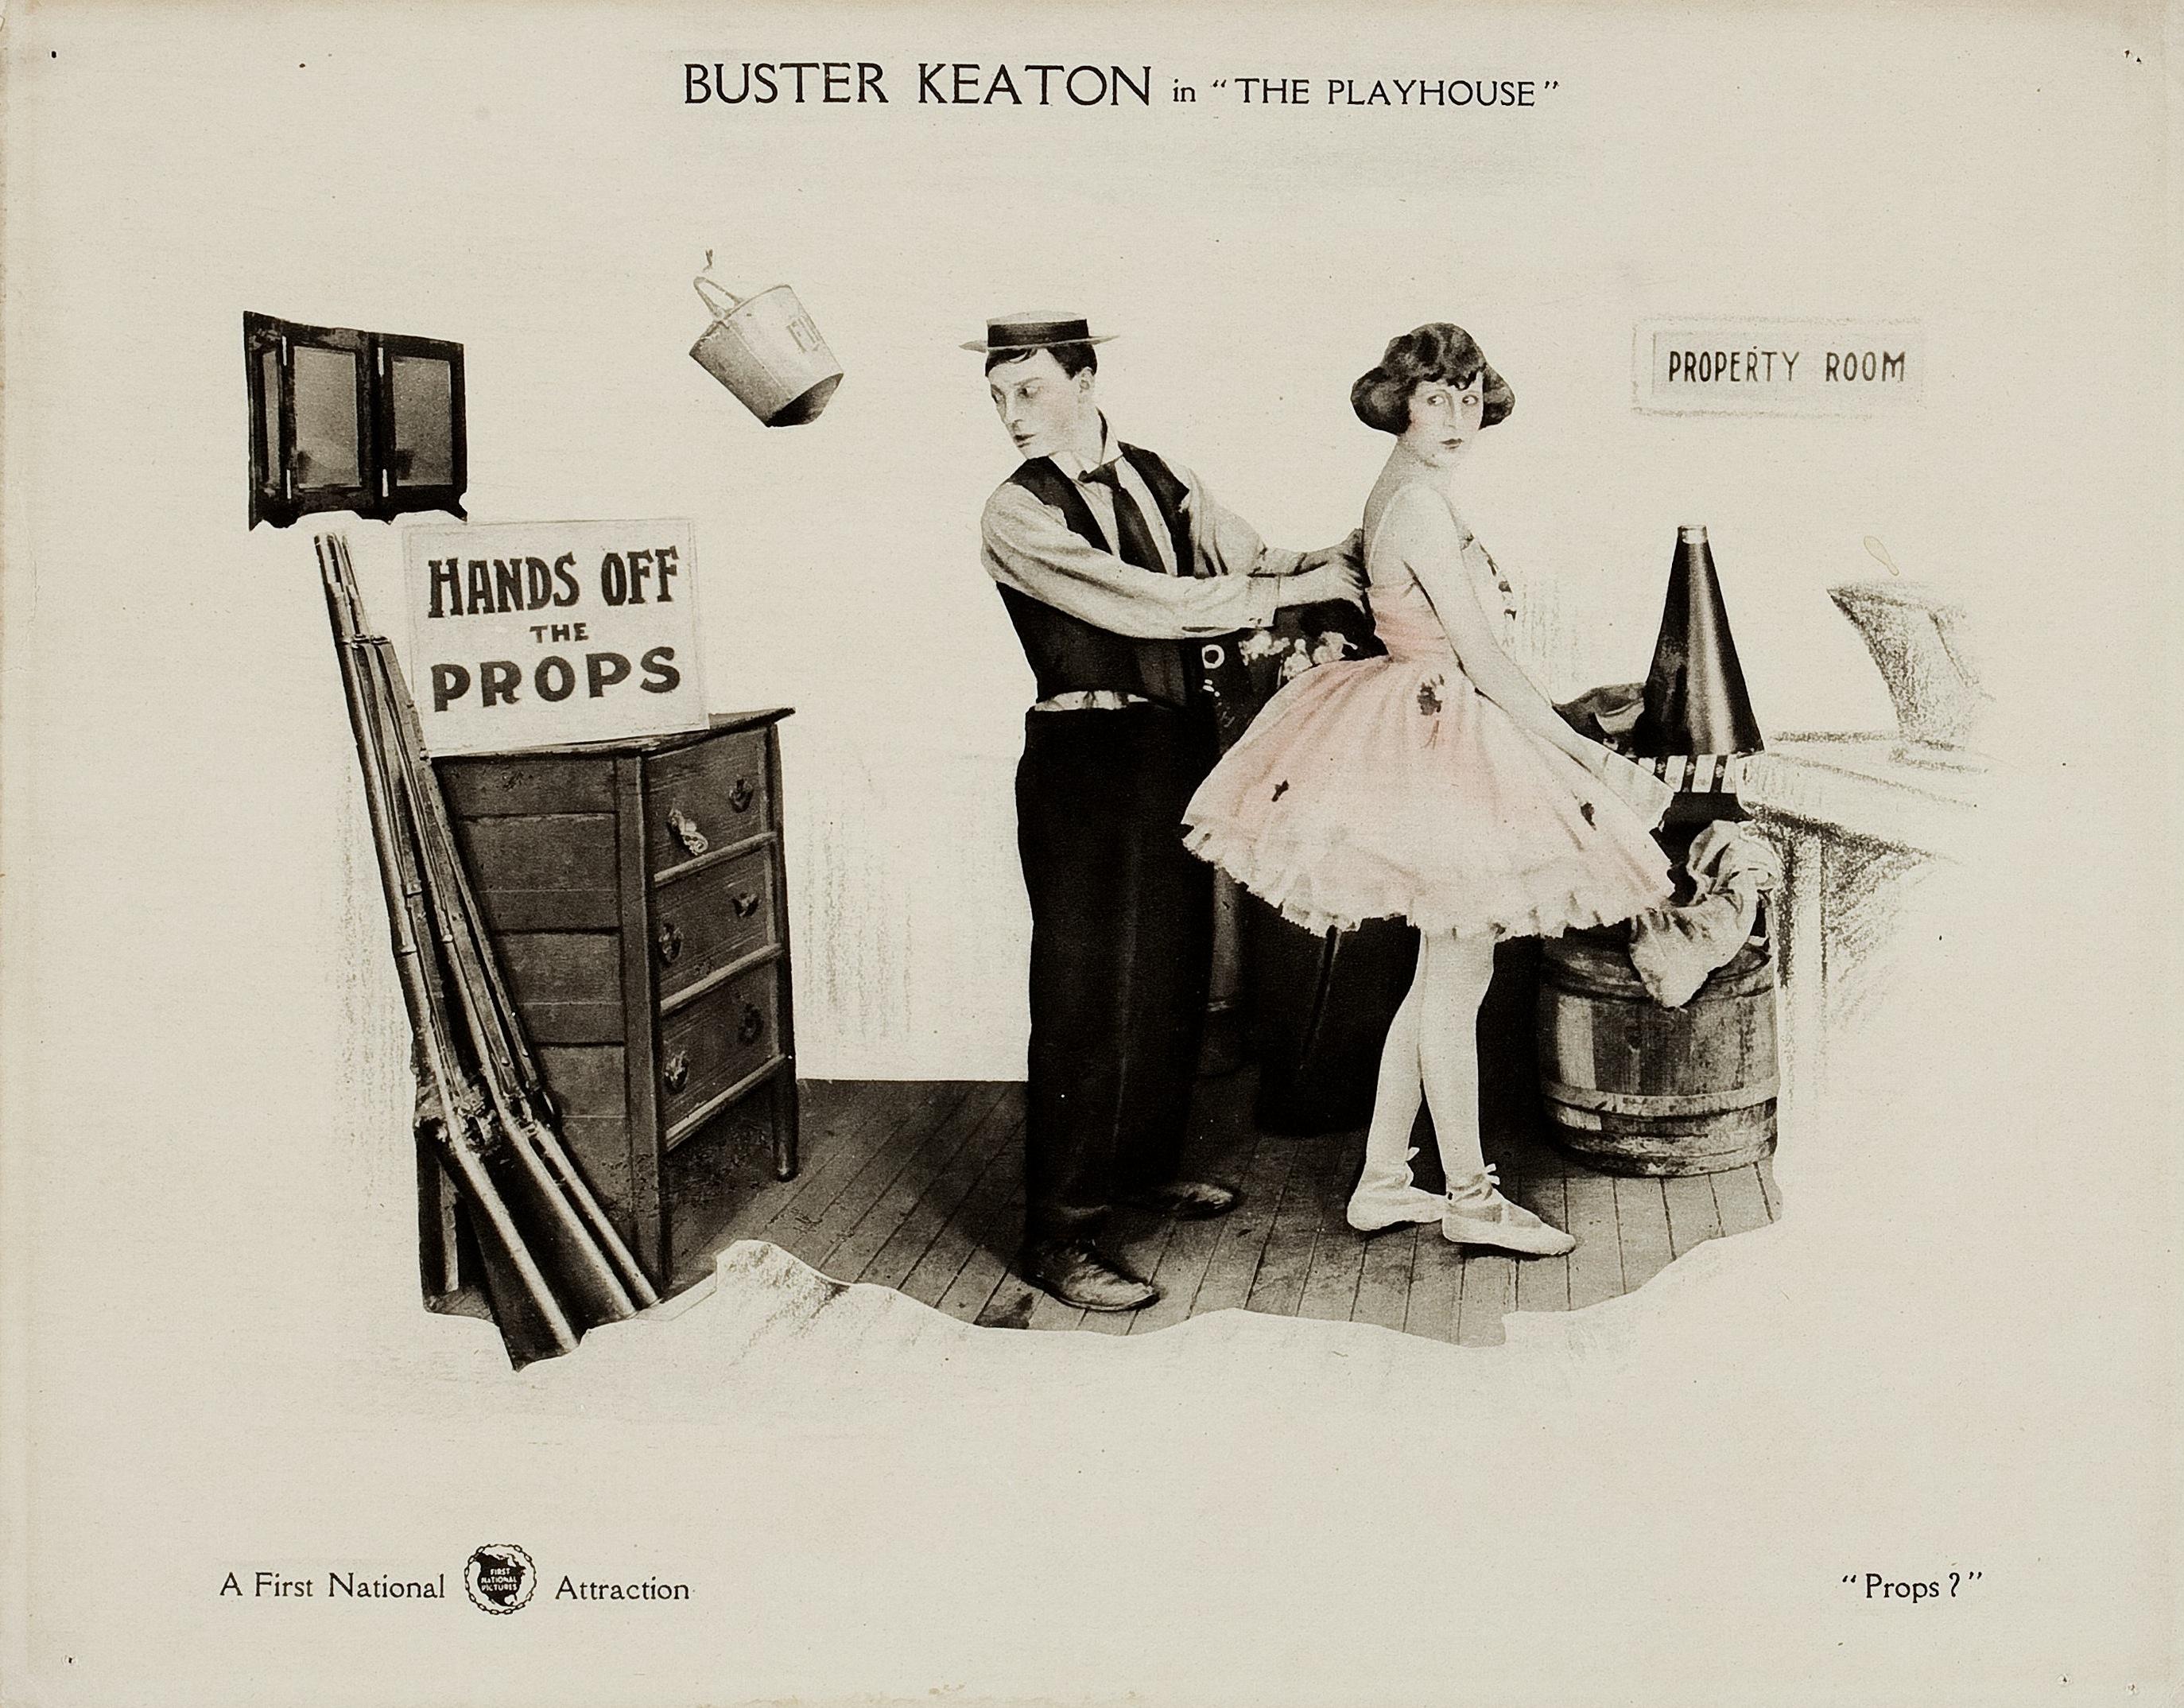 https://upload.wikimedia.org/wikipedia/commons/9/9a/ThePlayhouse-1921-lobbycard.jpg